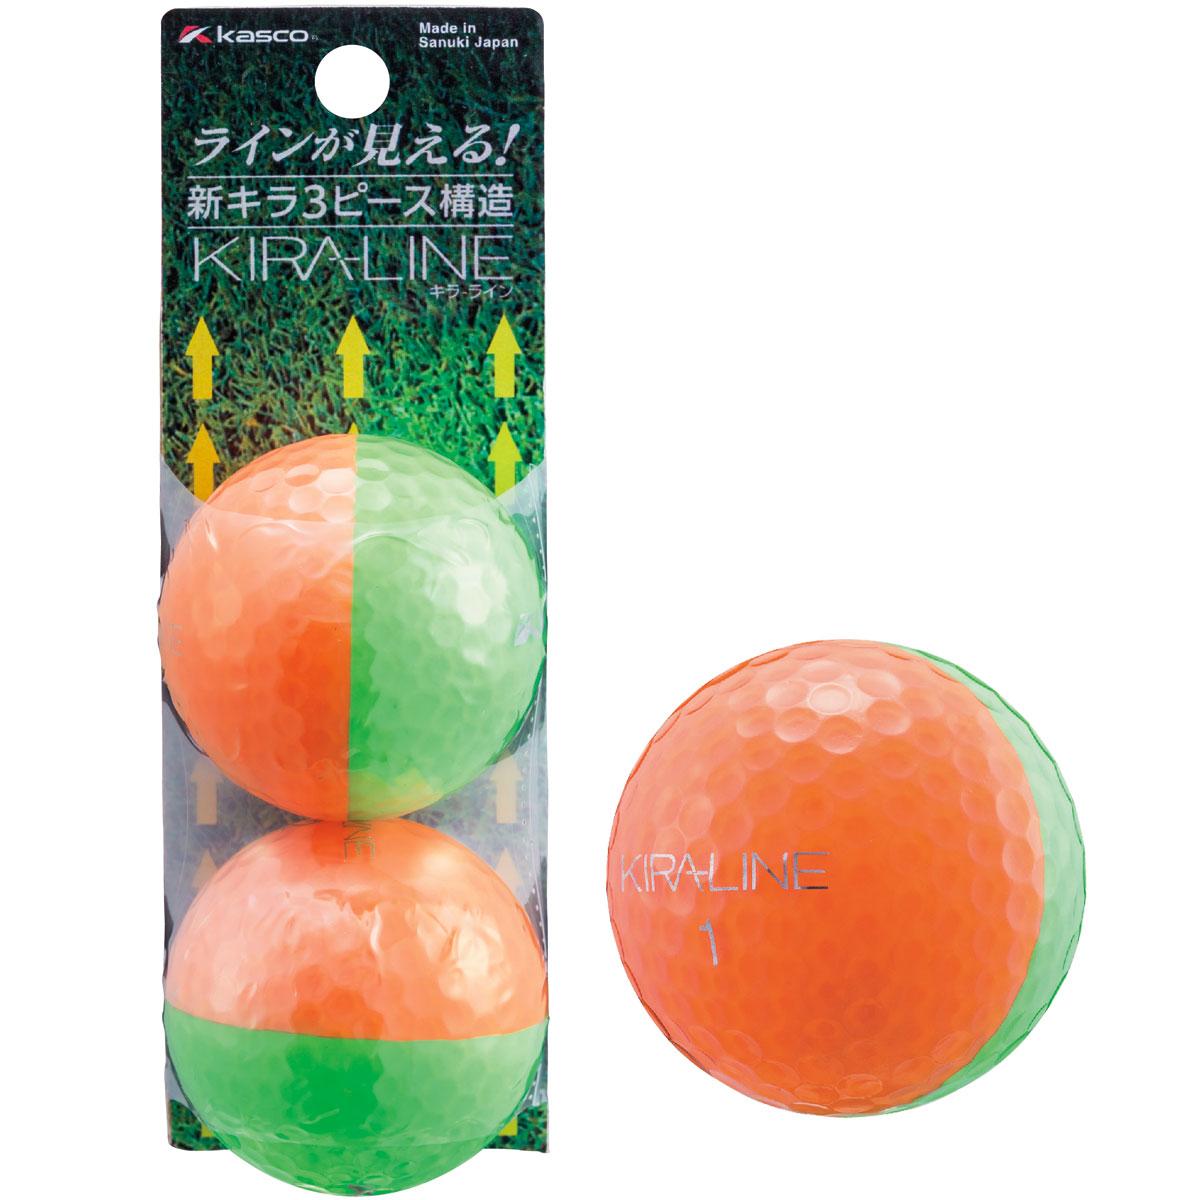 KIRA LINE ボール 2球パック